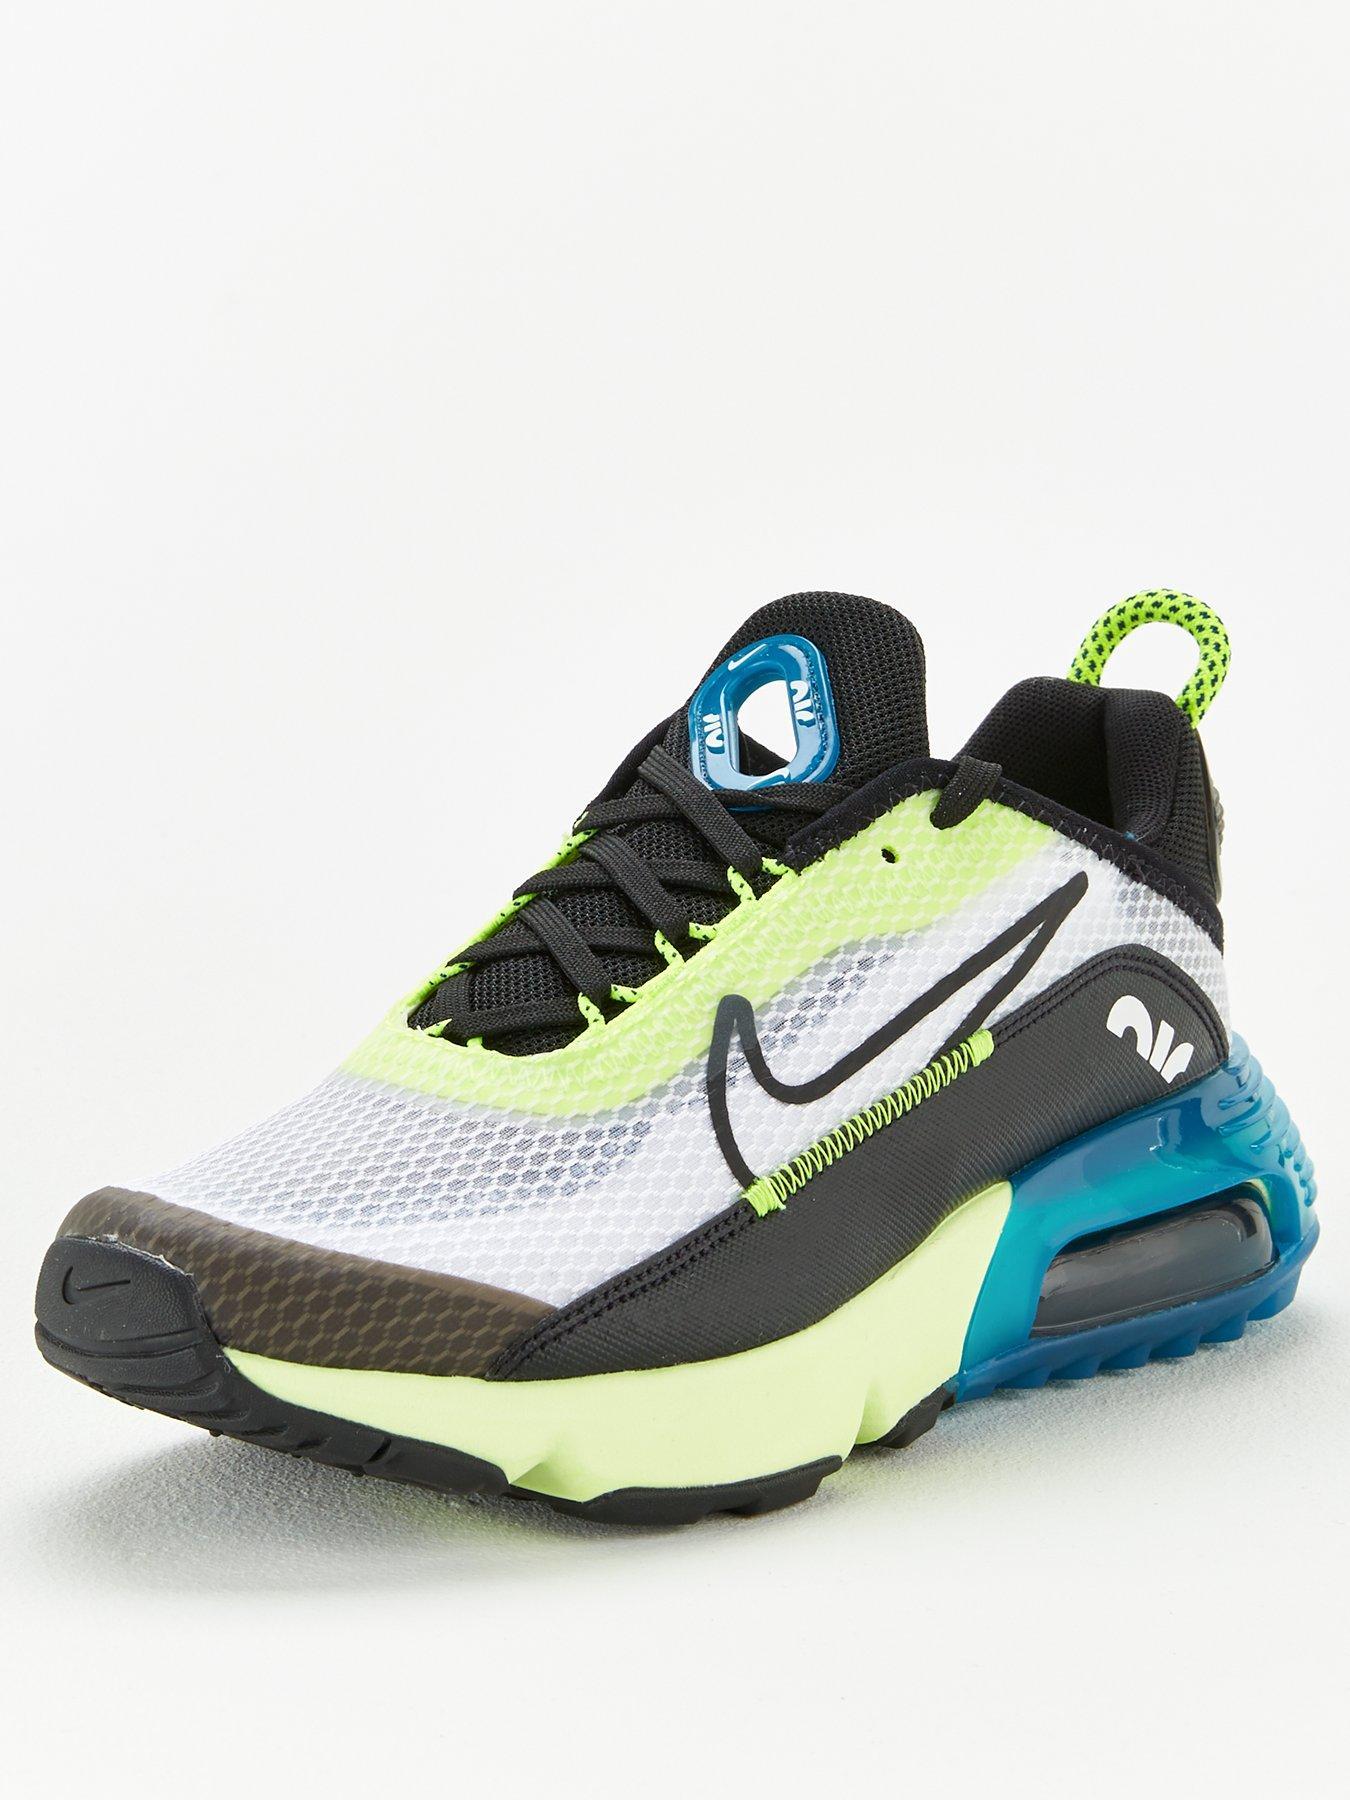 Junior footwear (sizes 3-6) | Trainers